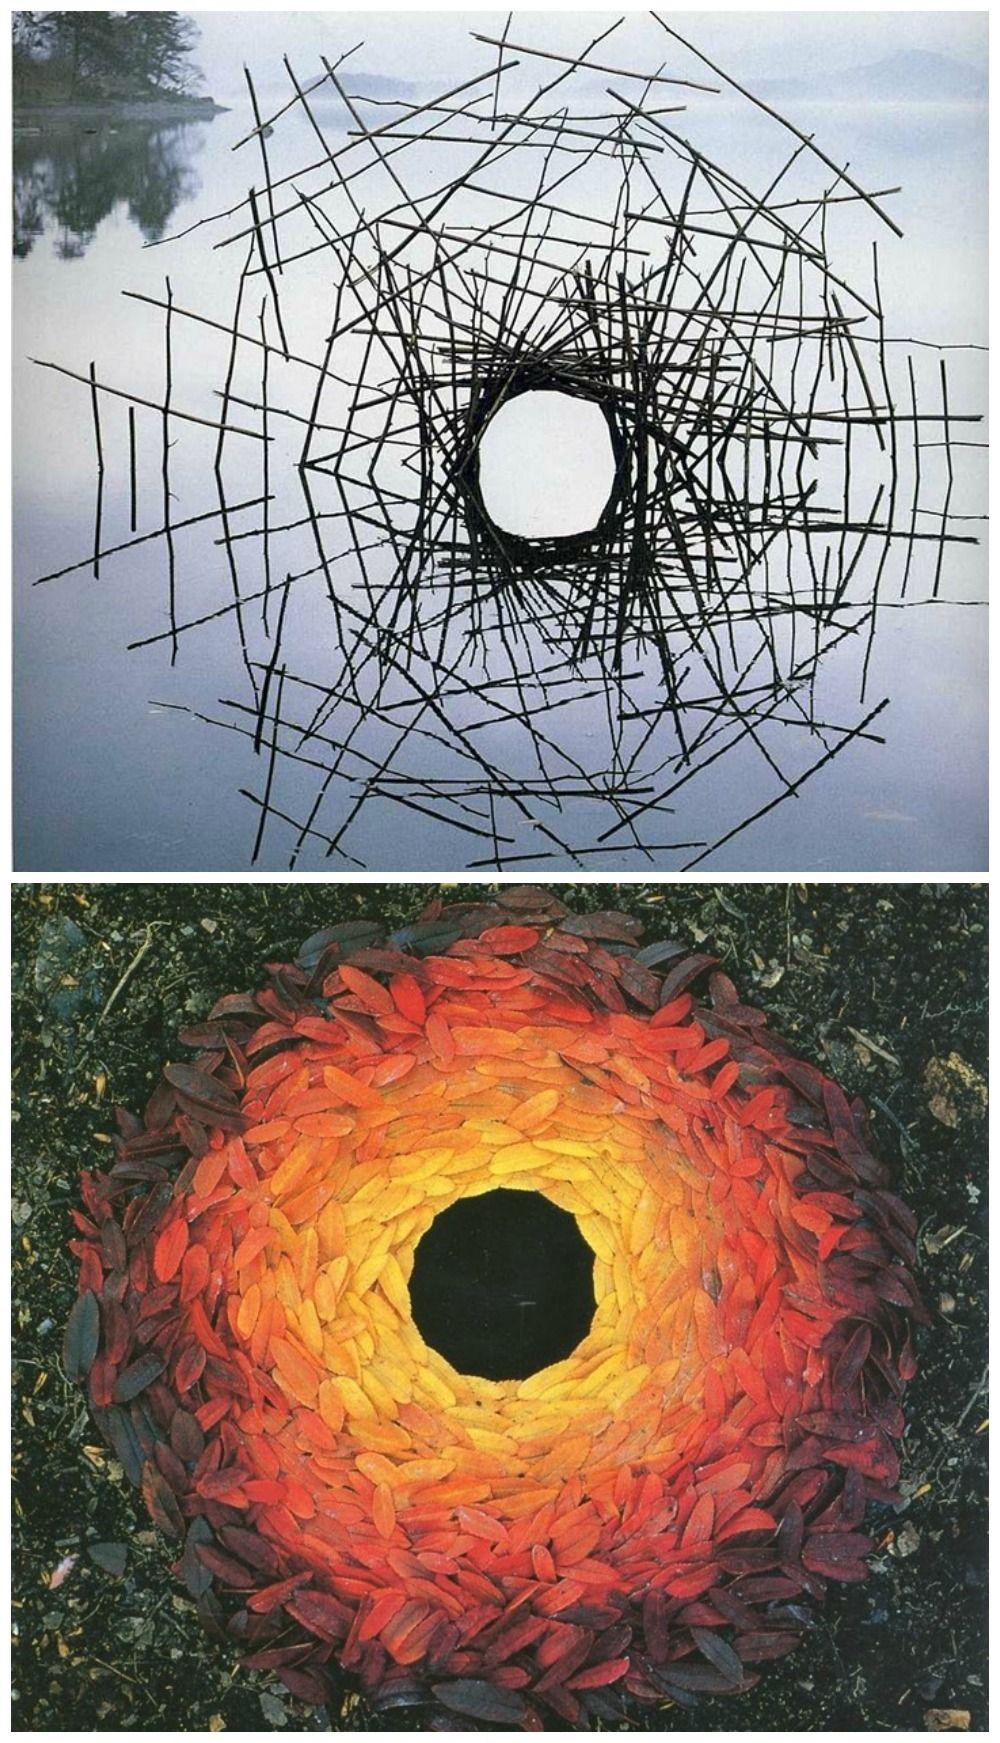 Nature Art: 13 Amazing Environmental Installation Artists